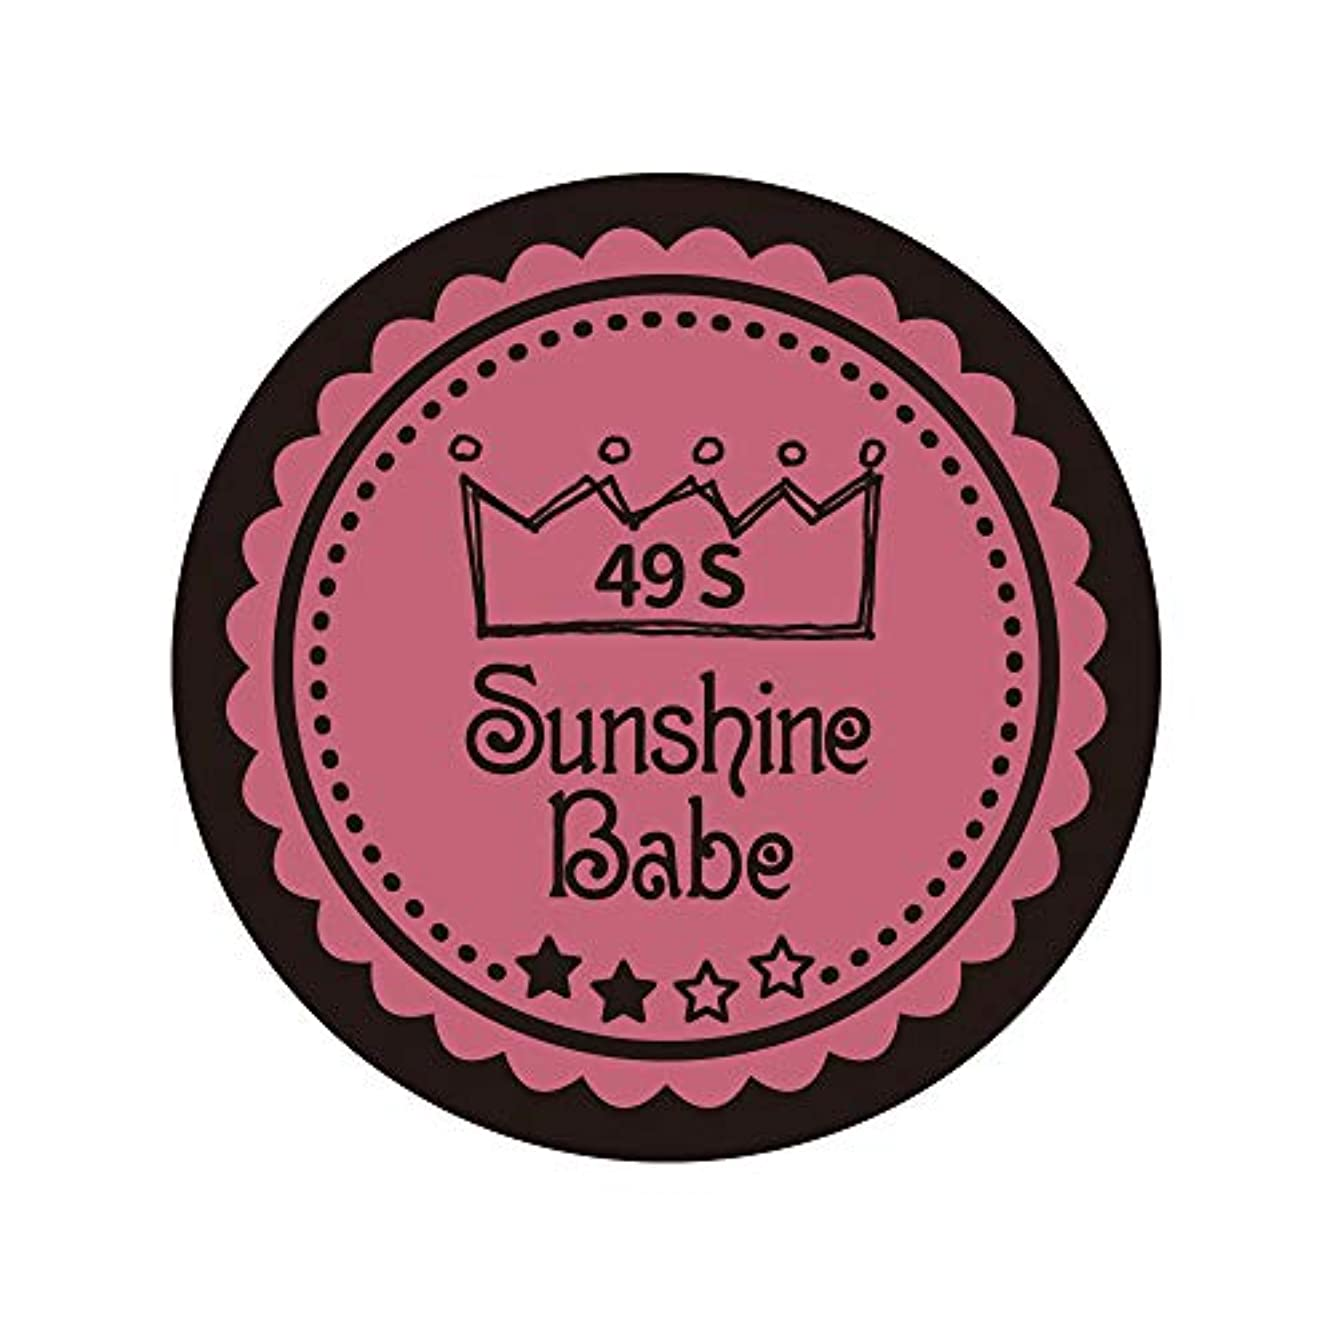 Sunshine Babe カラージェル 49S カシミアピンク 4g UV/LED対応